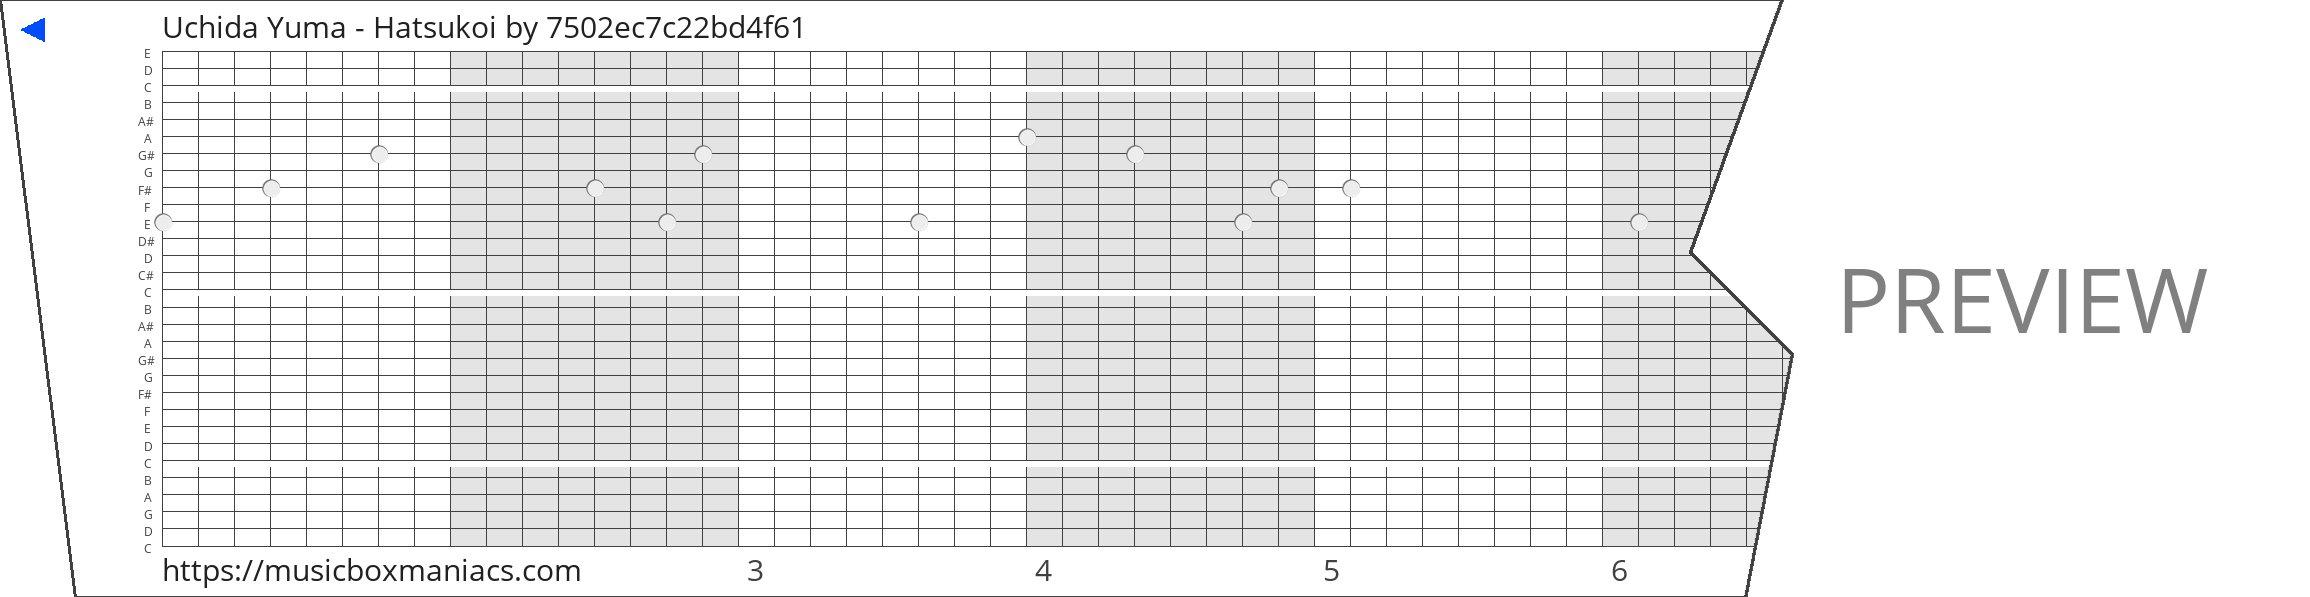 Uchida Yuma - Hatsukoi 30 note music box paper strip